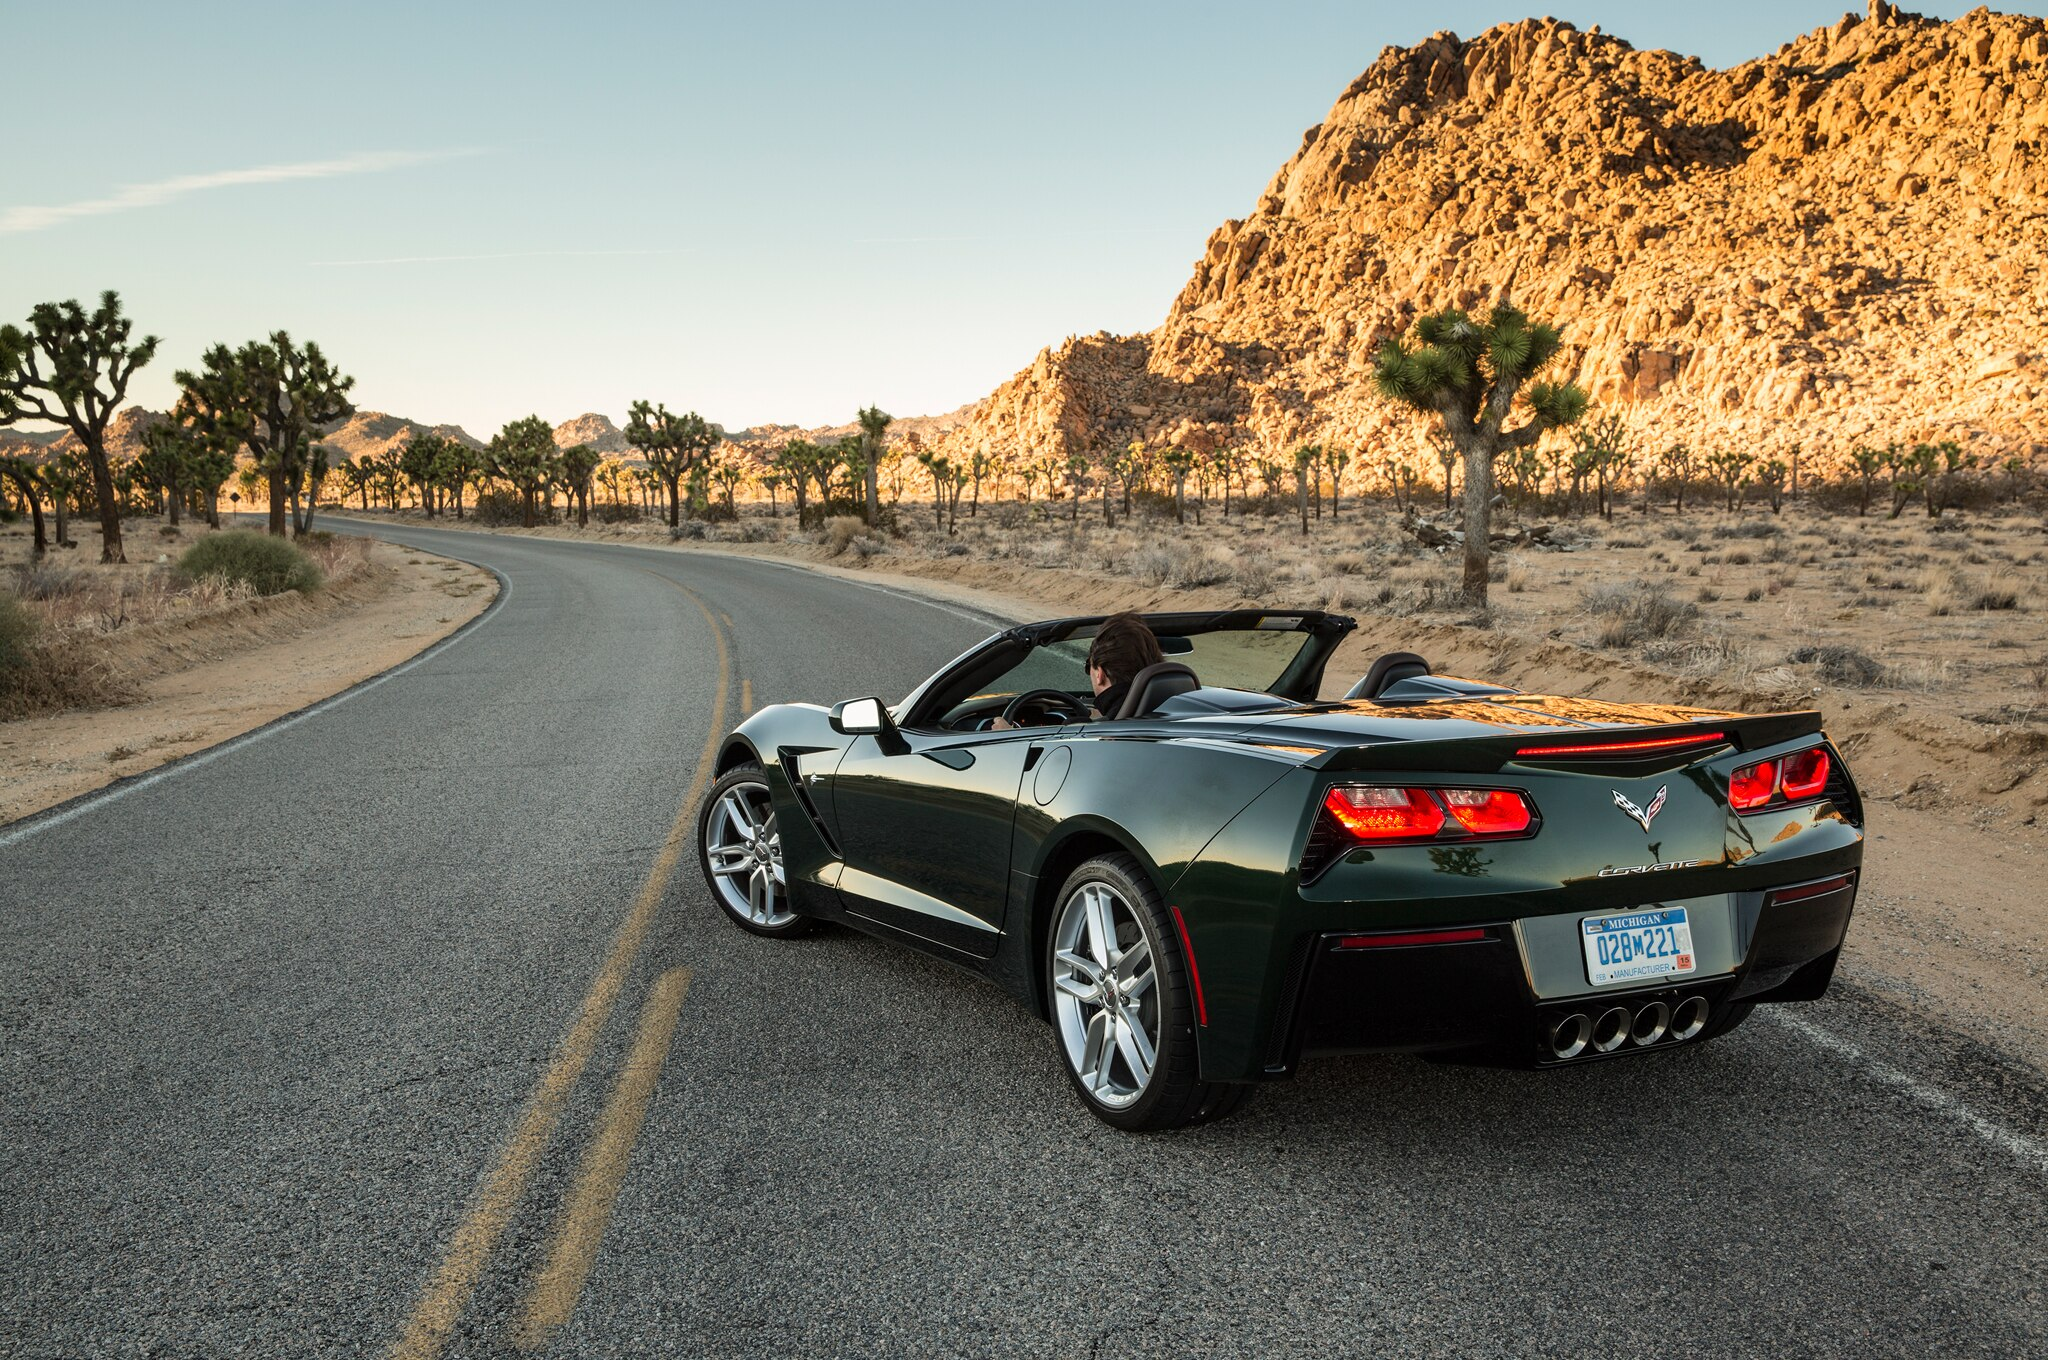 choosing - 2014 Chevrolet Corvette Stingray Convertible